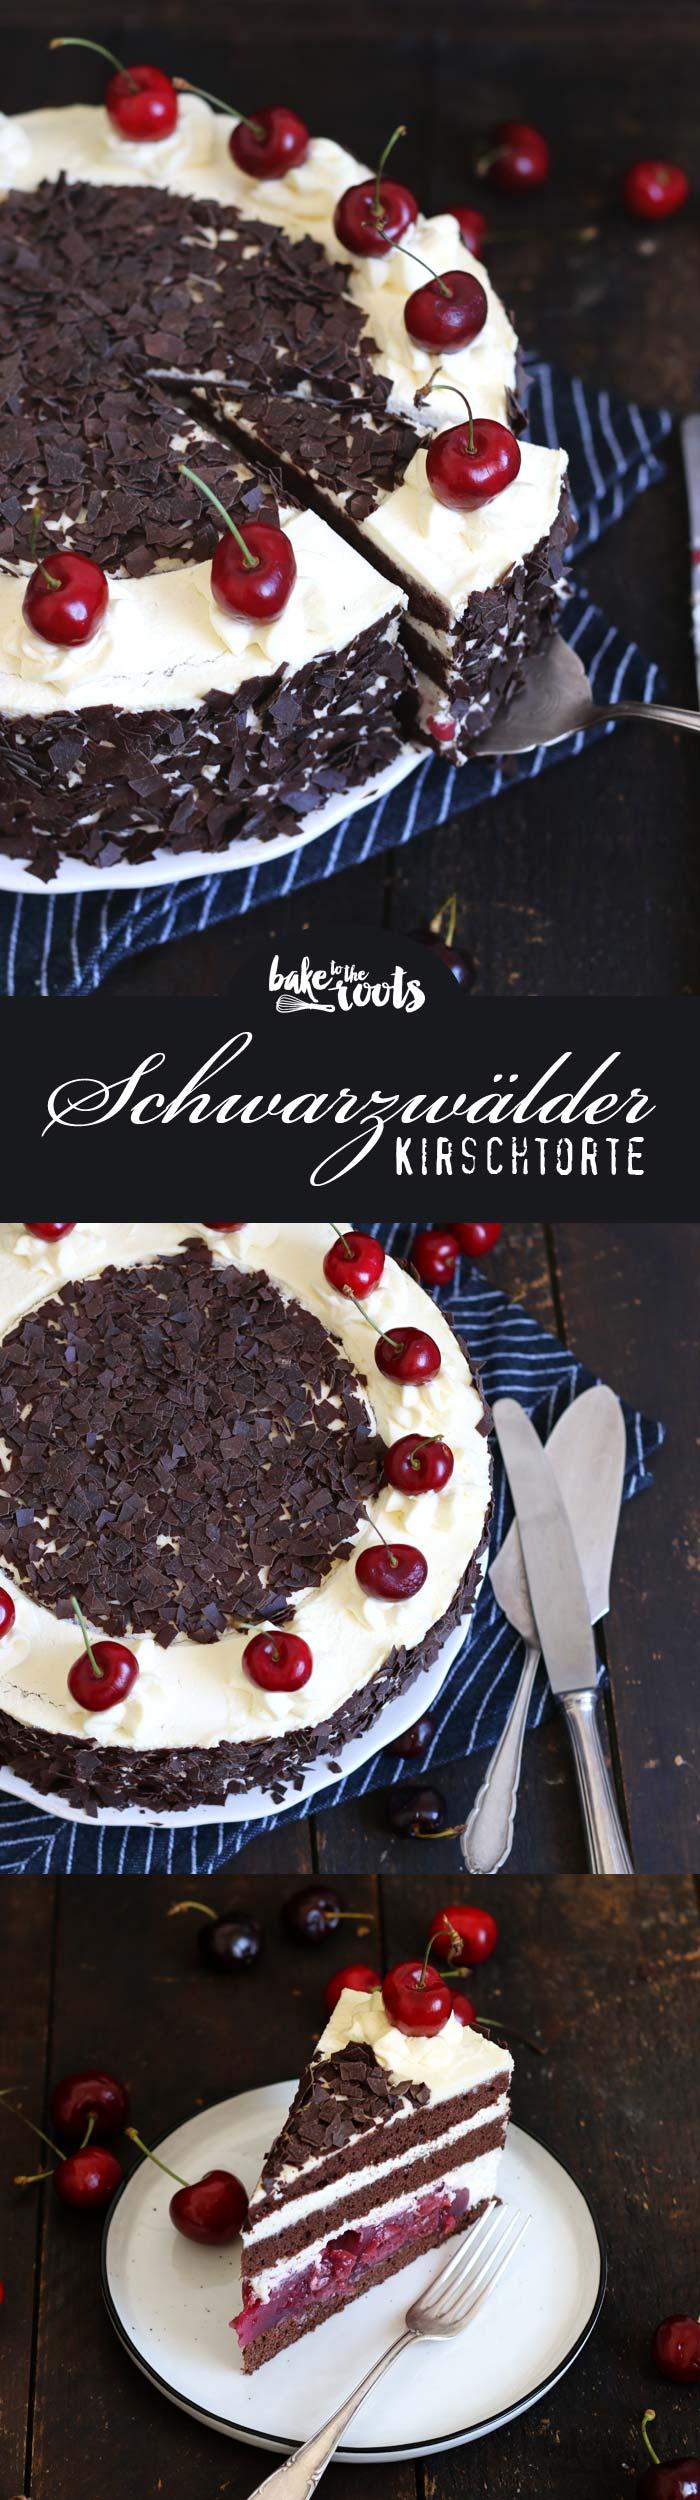 Delicious Black Forest Cake aka. Schwarzwälder Kirschtorte | Bake to the roots